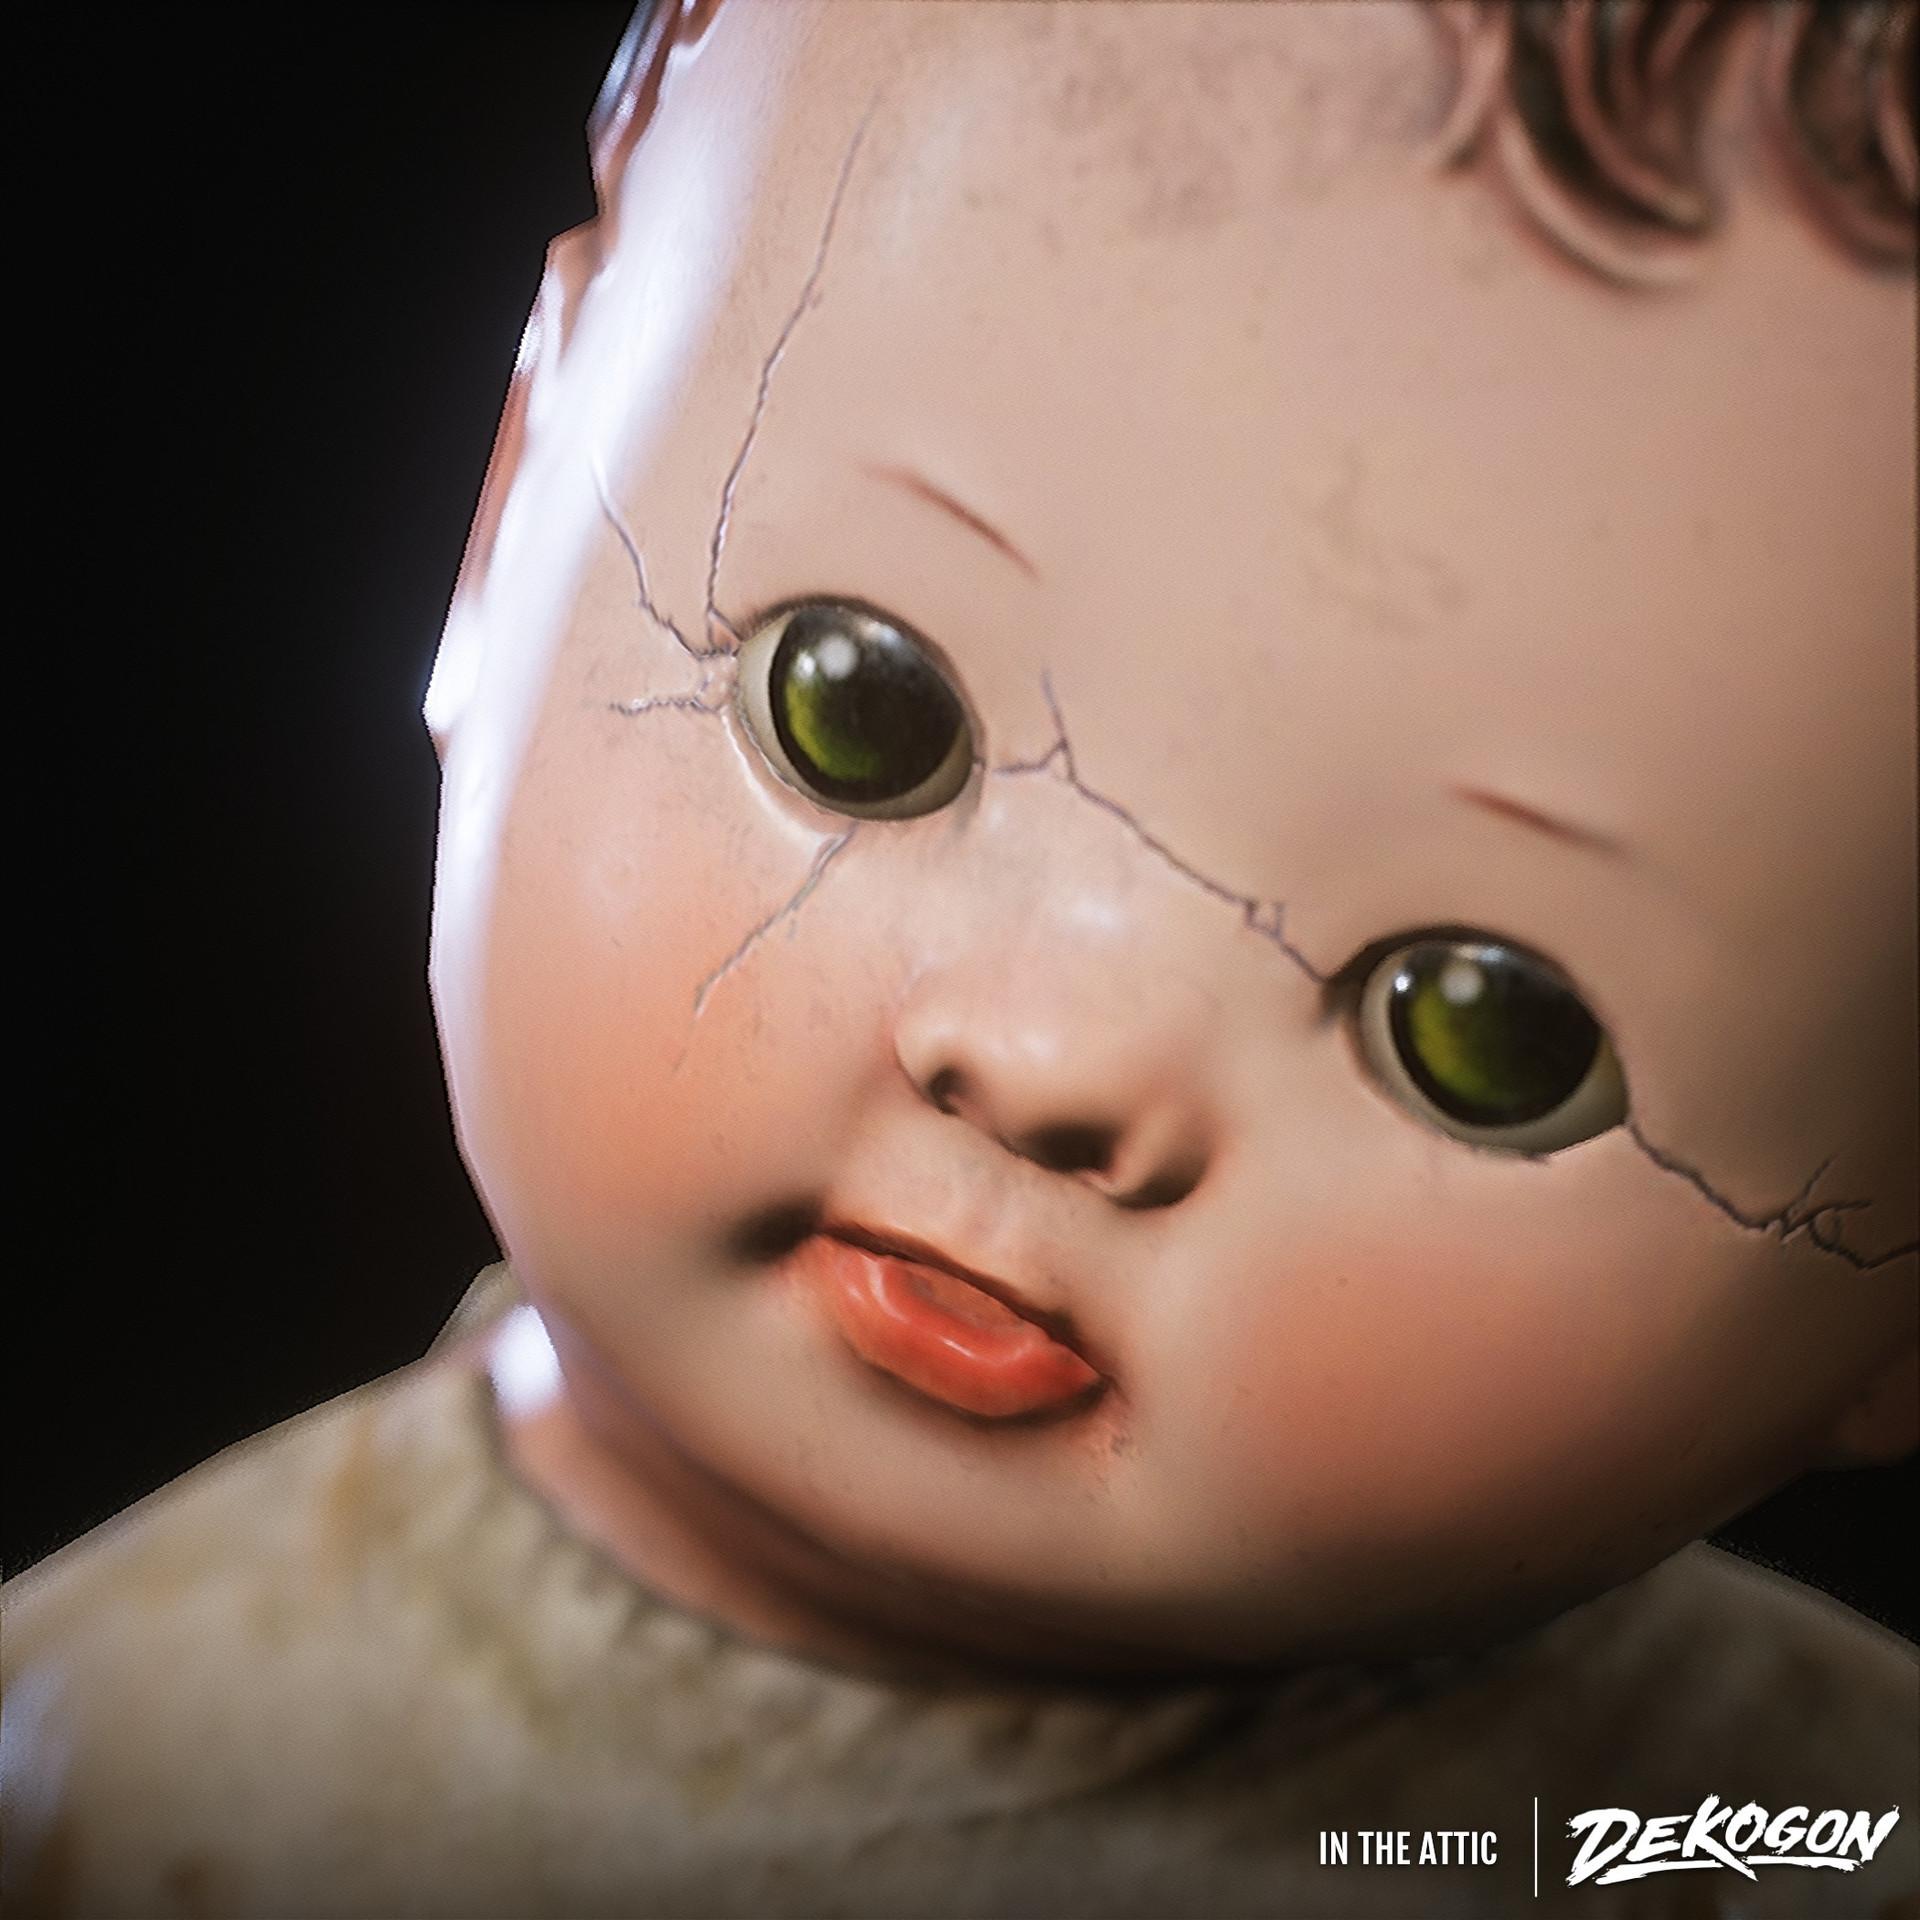 Wahyu nugraha doll 01a 07